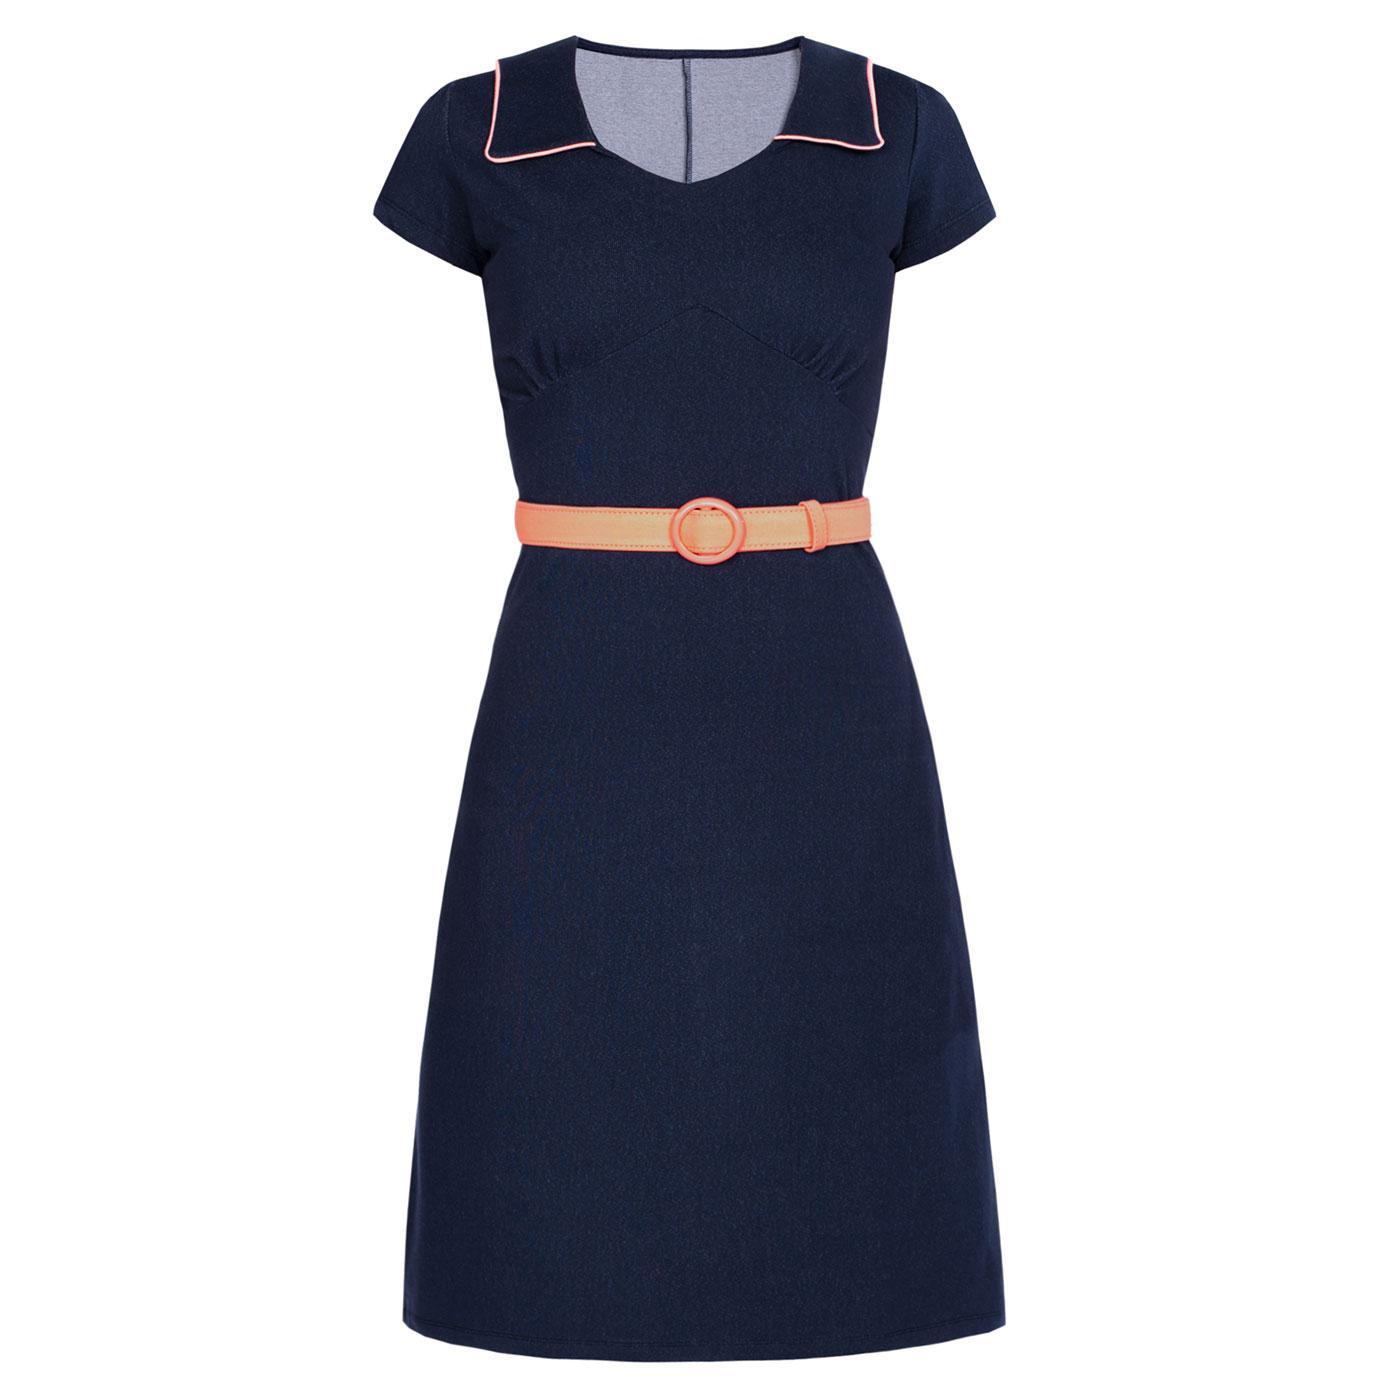 Vintage Moments MADEMOISELLE YEYE Denim Mod Dress